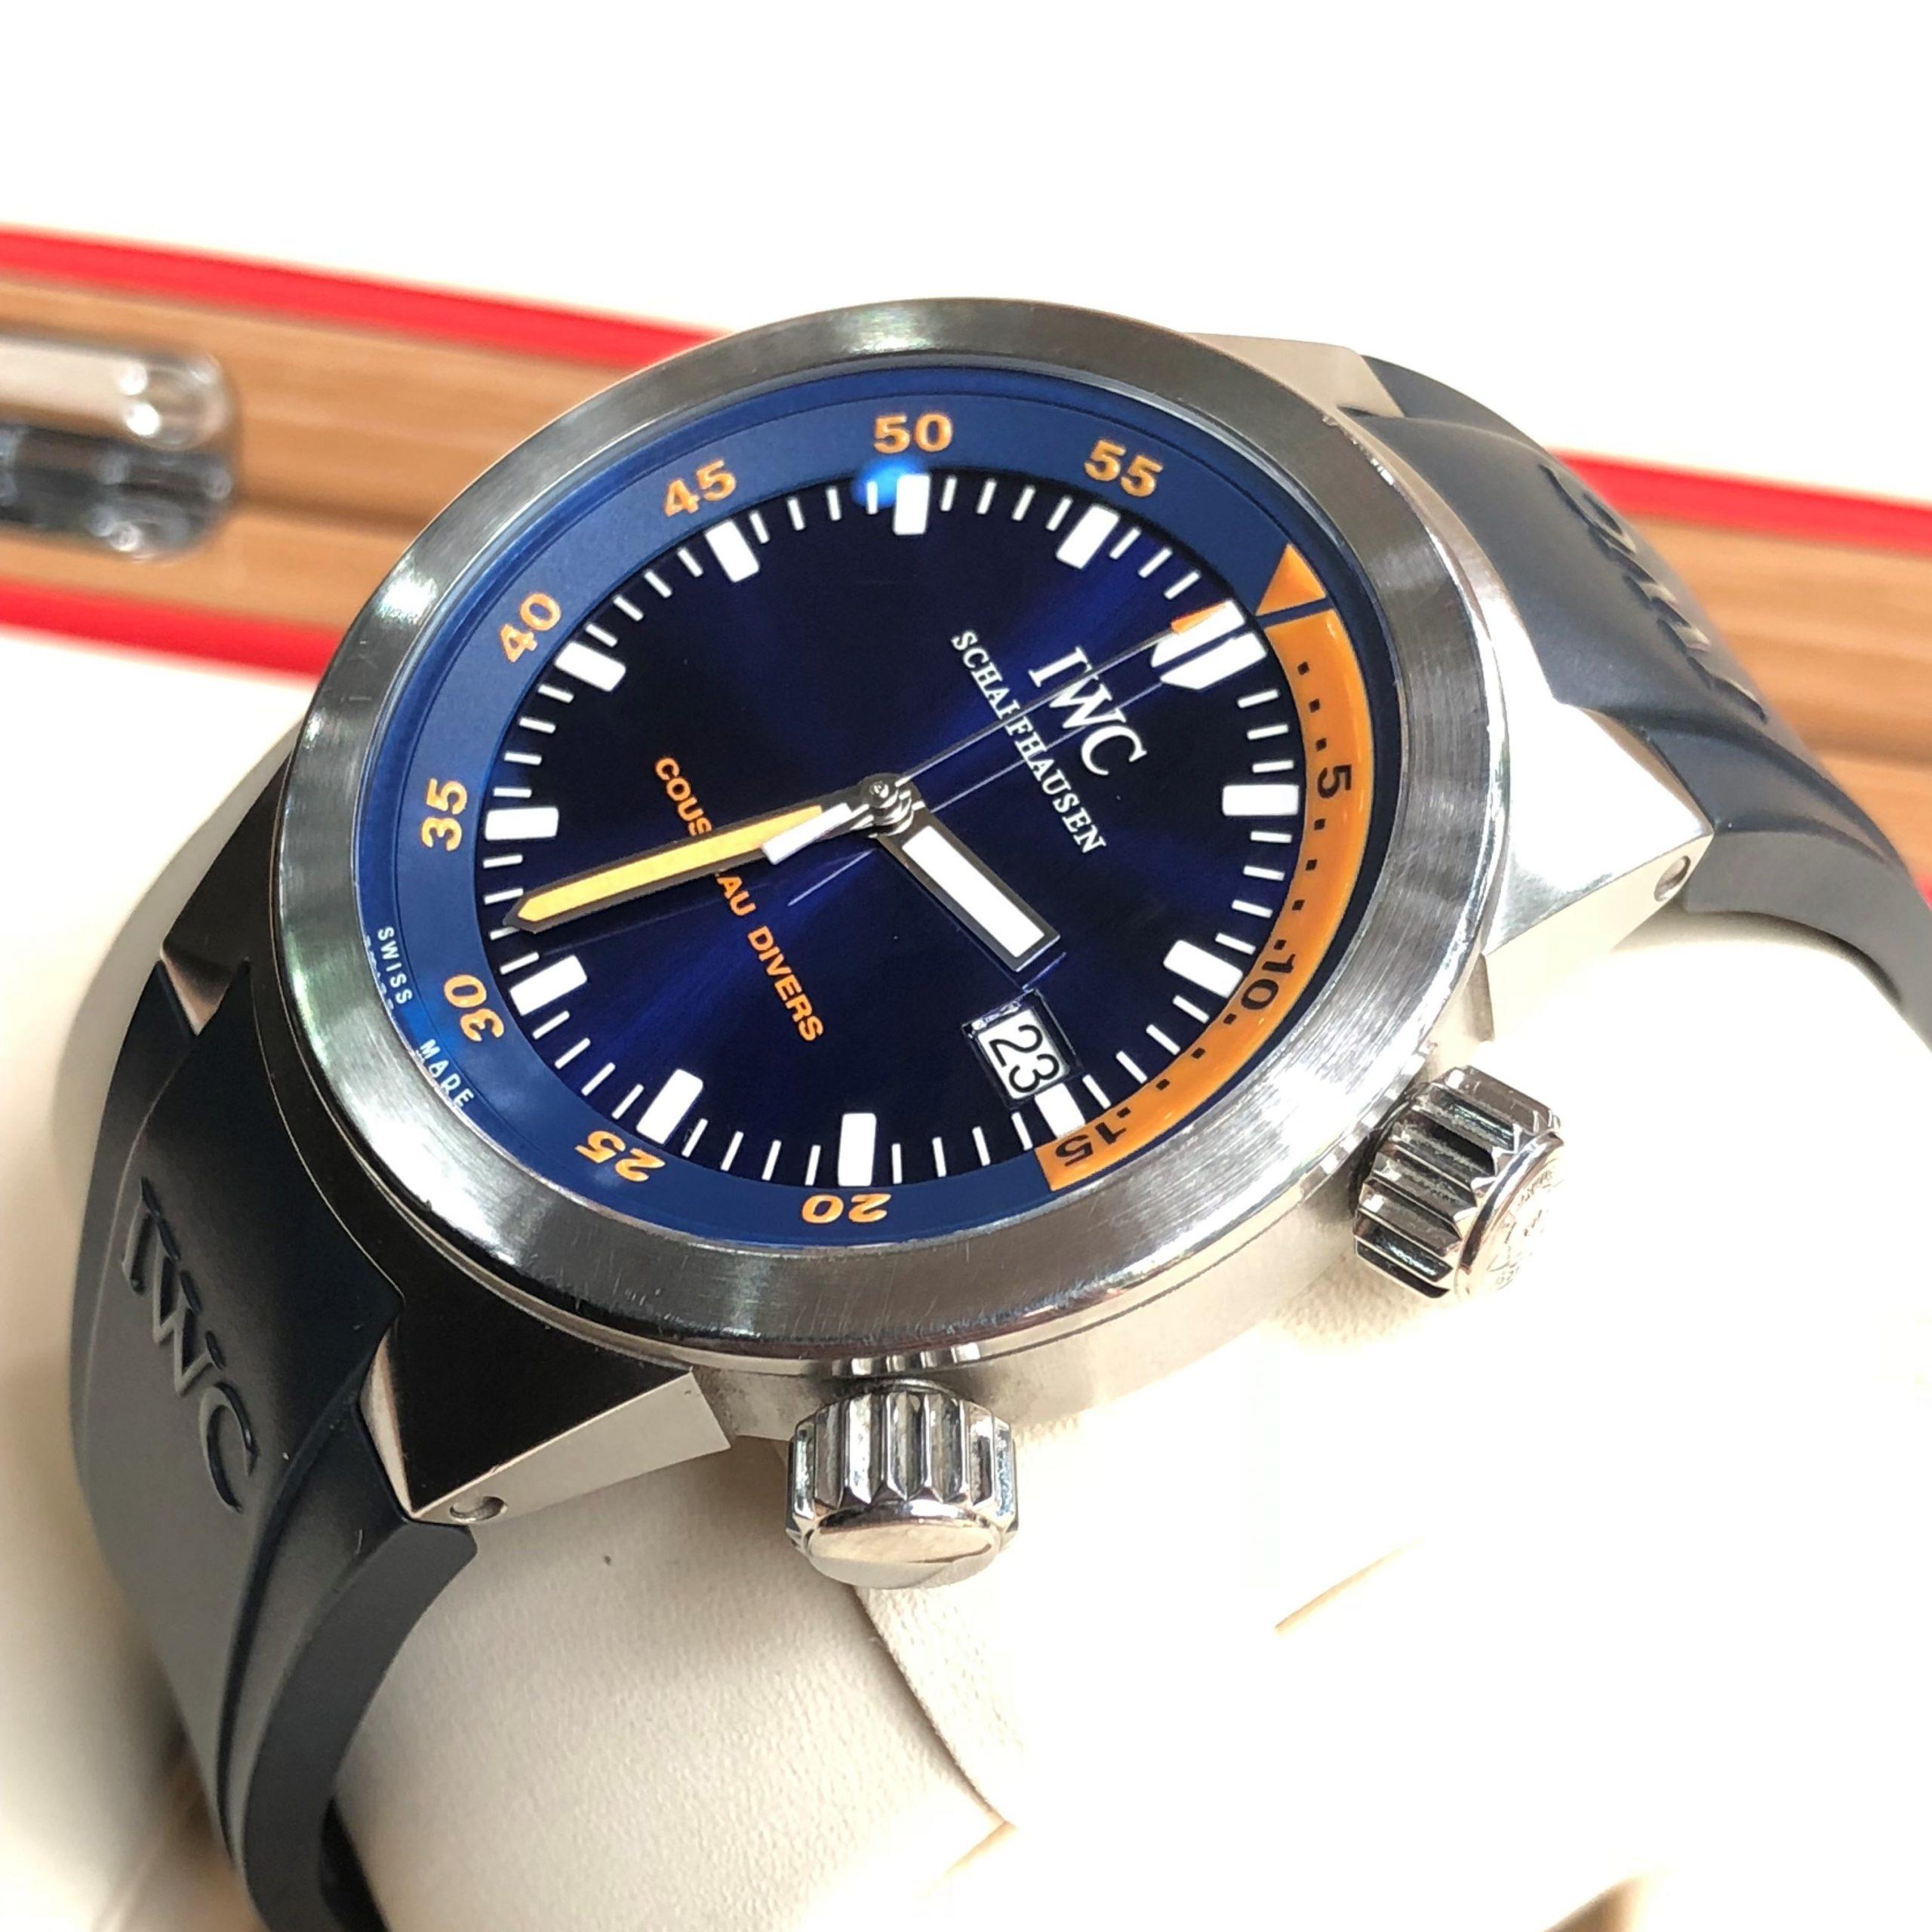 IWC Aquatimer Cousteau Divers Automatic Limited Edition 568/1953